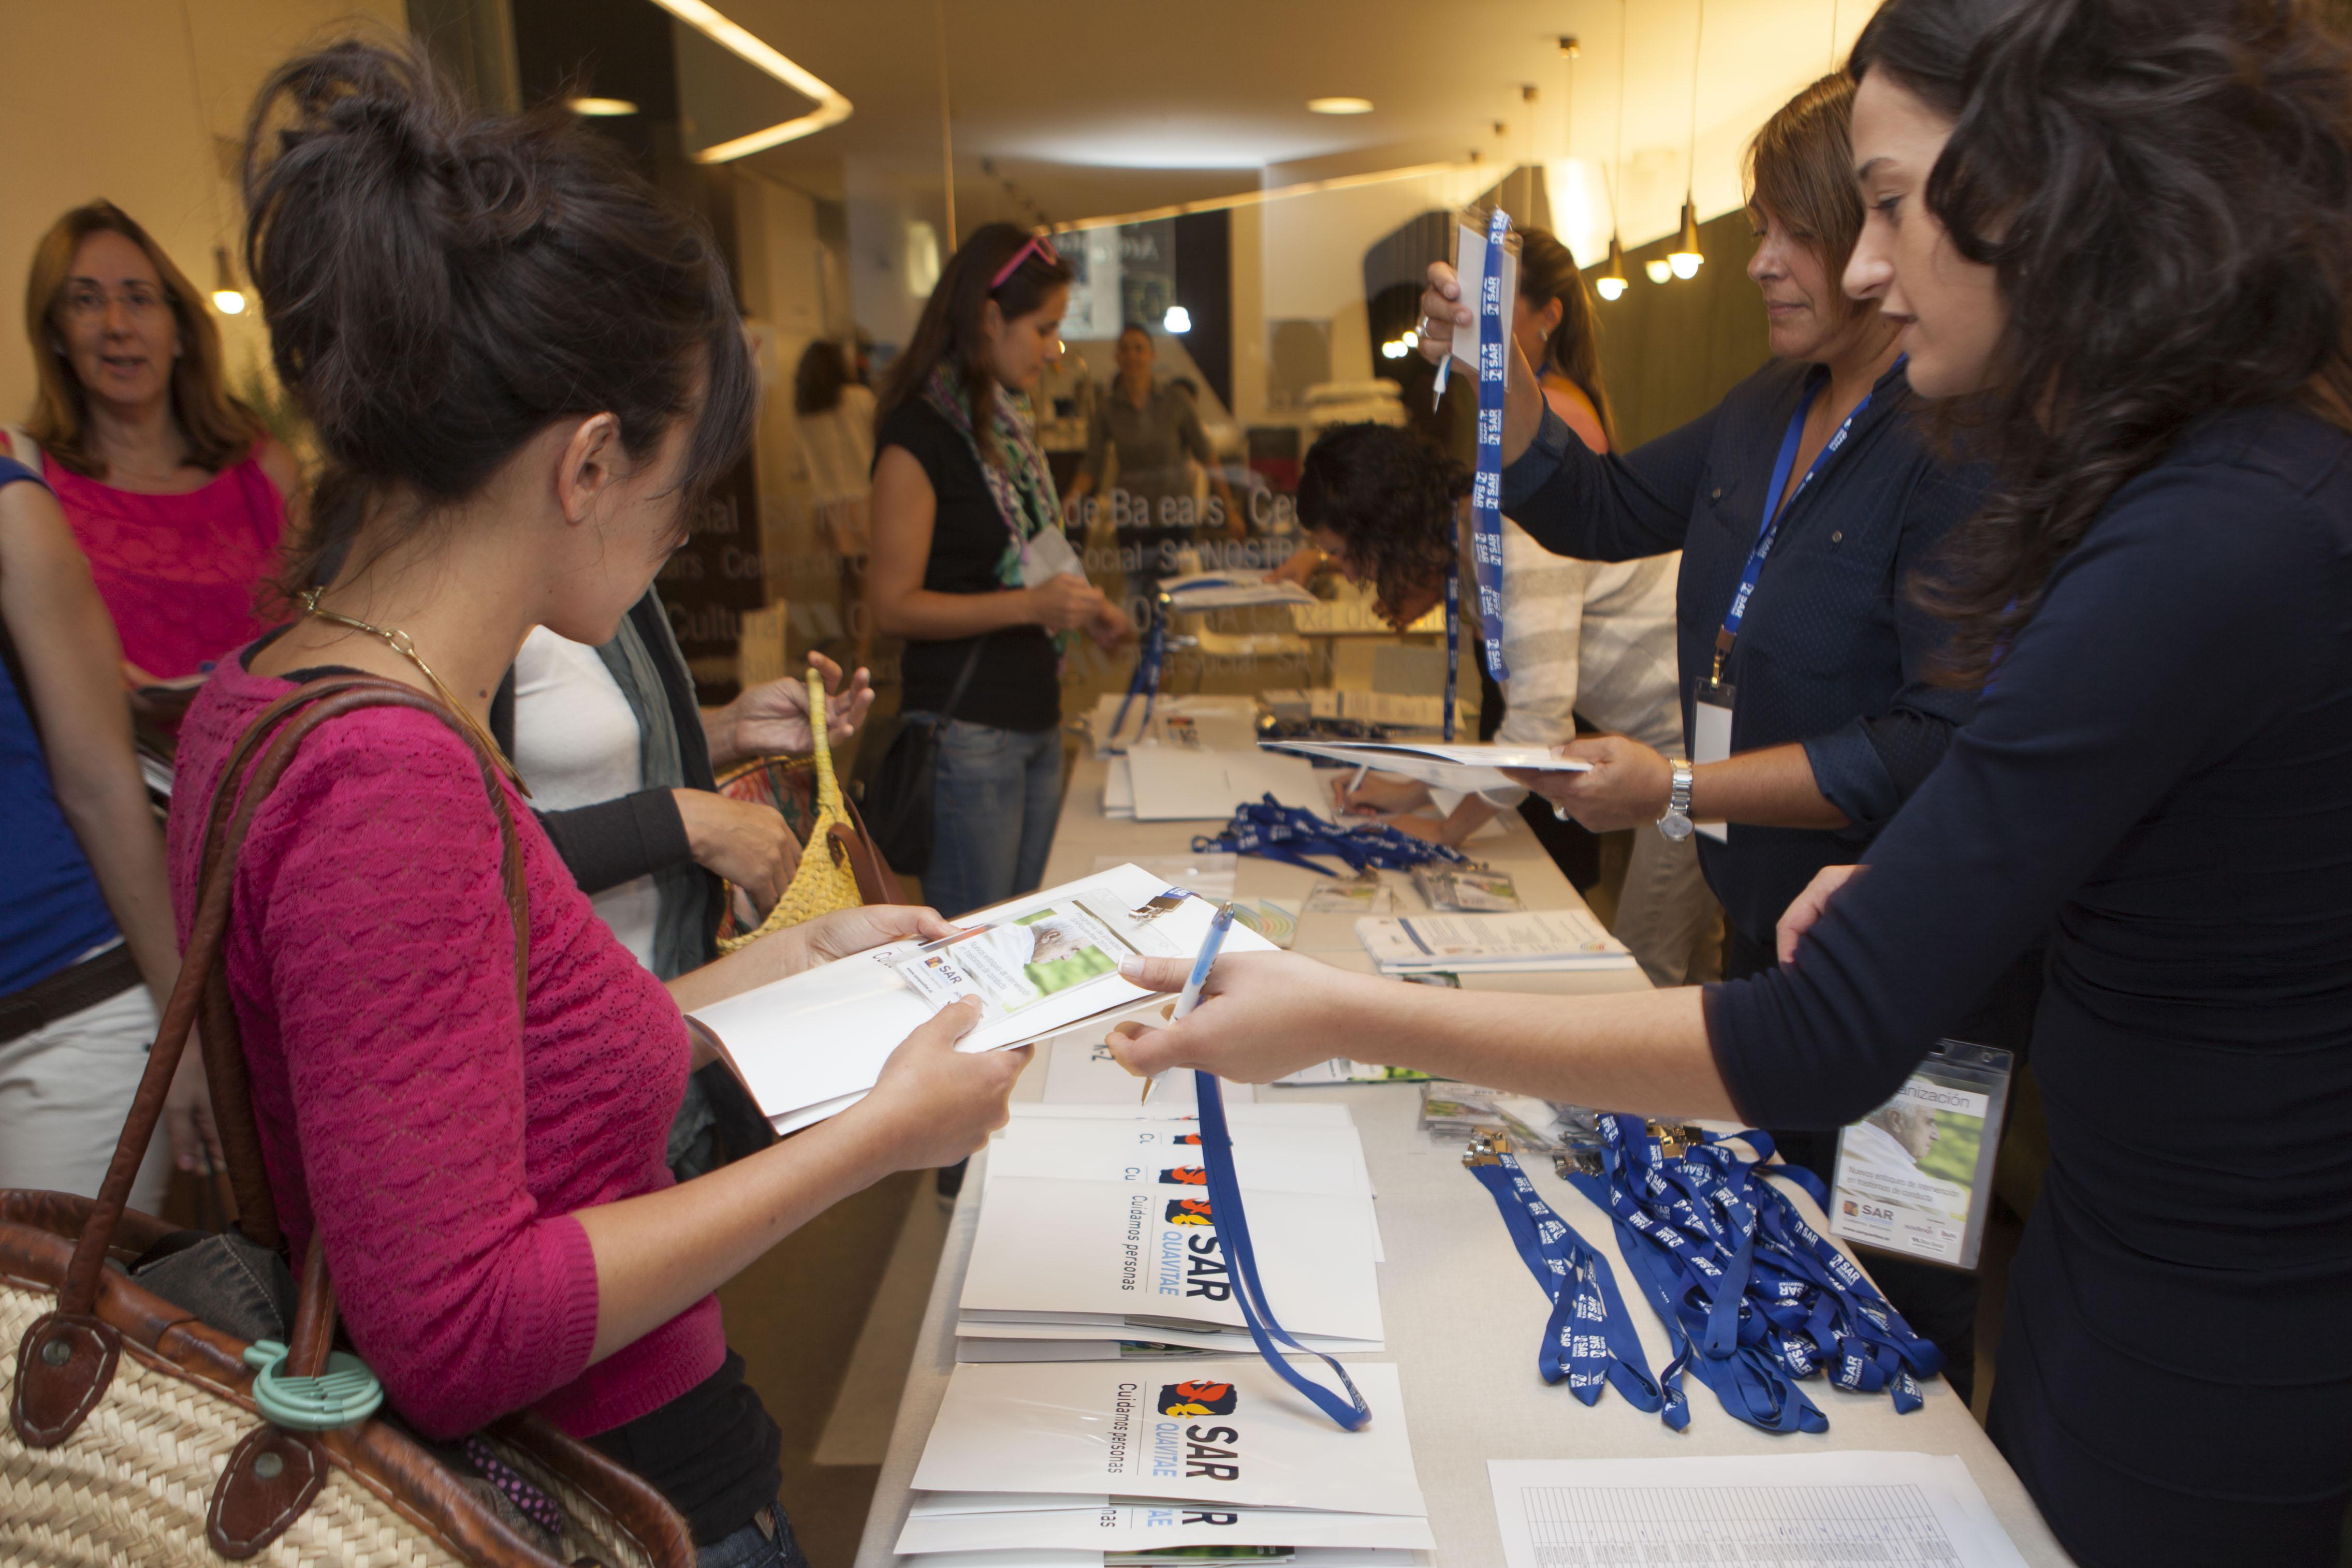 14-10-2014 Jornada SarQuavitae Palma de Mallorca 1